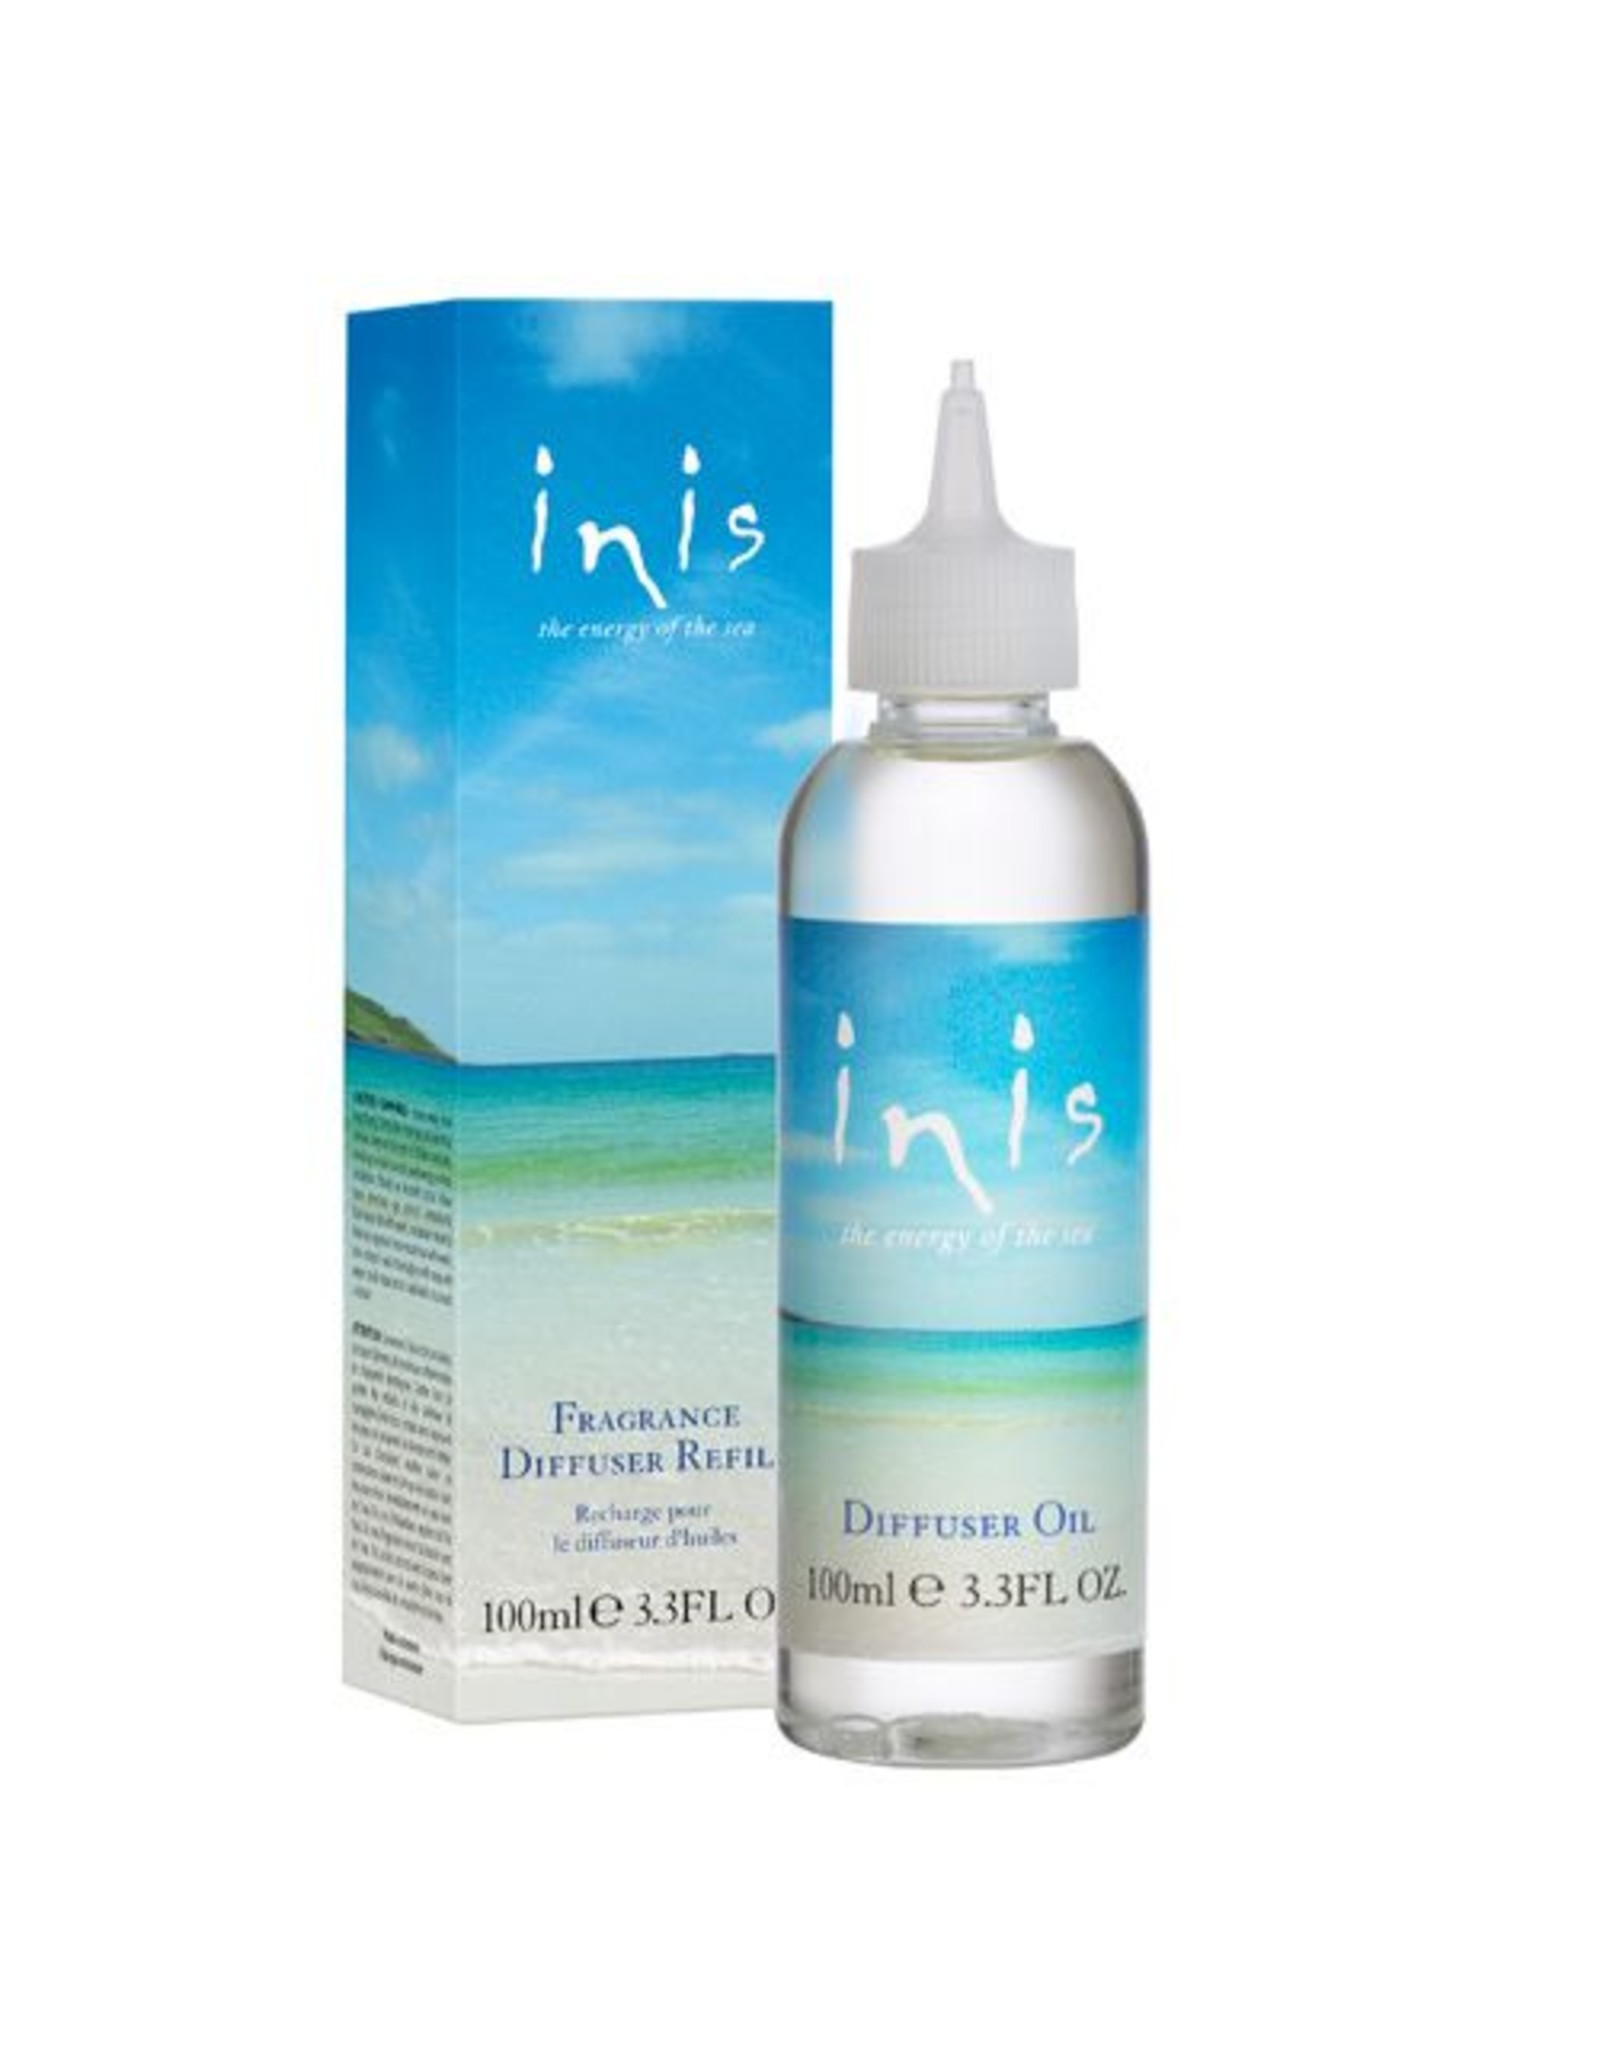 Fragrances of Ireland Ltd. Inis Energy of the Sea Diffuser Refills 100ml / 3.3 fl. oz.